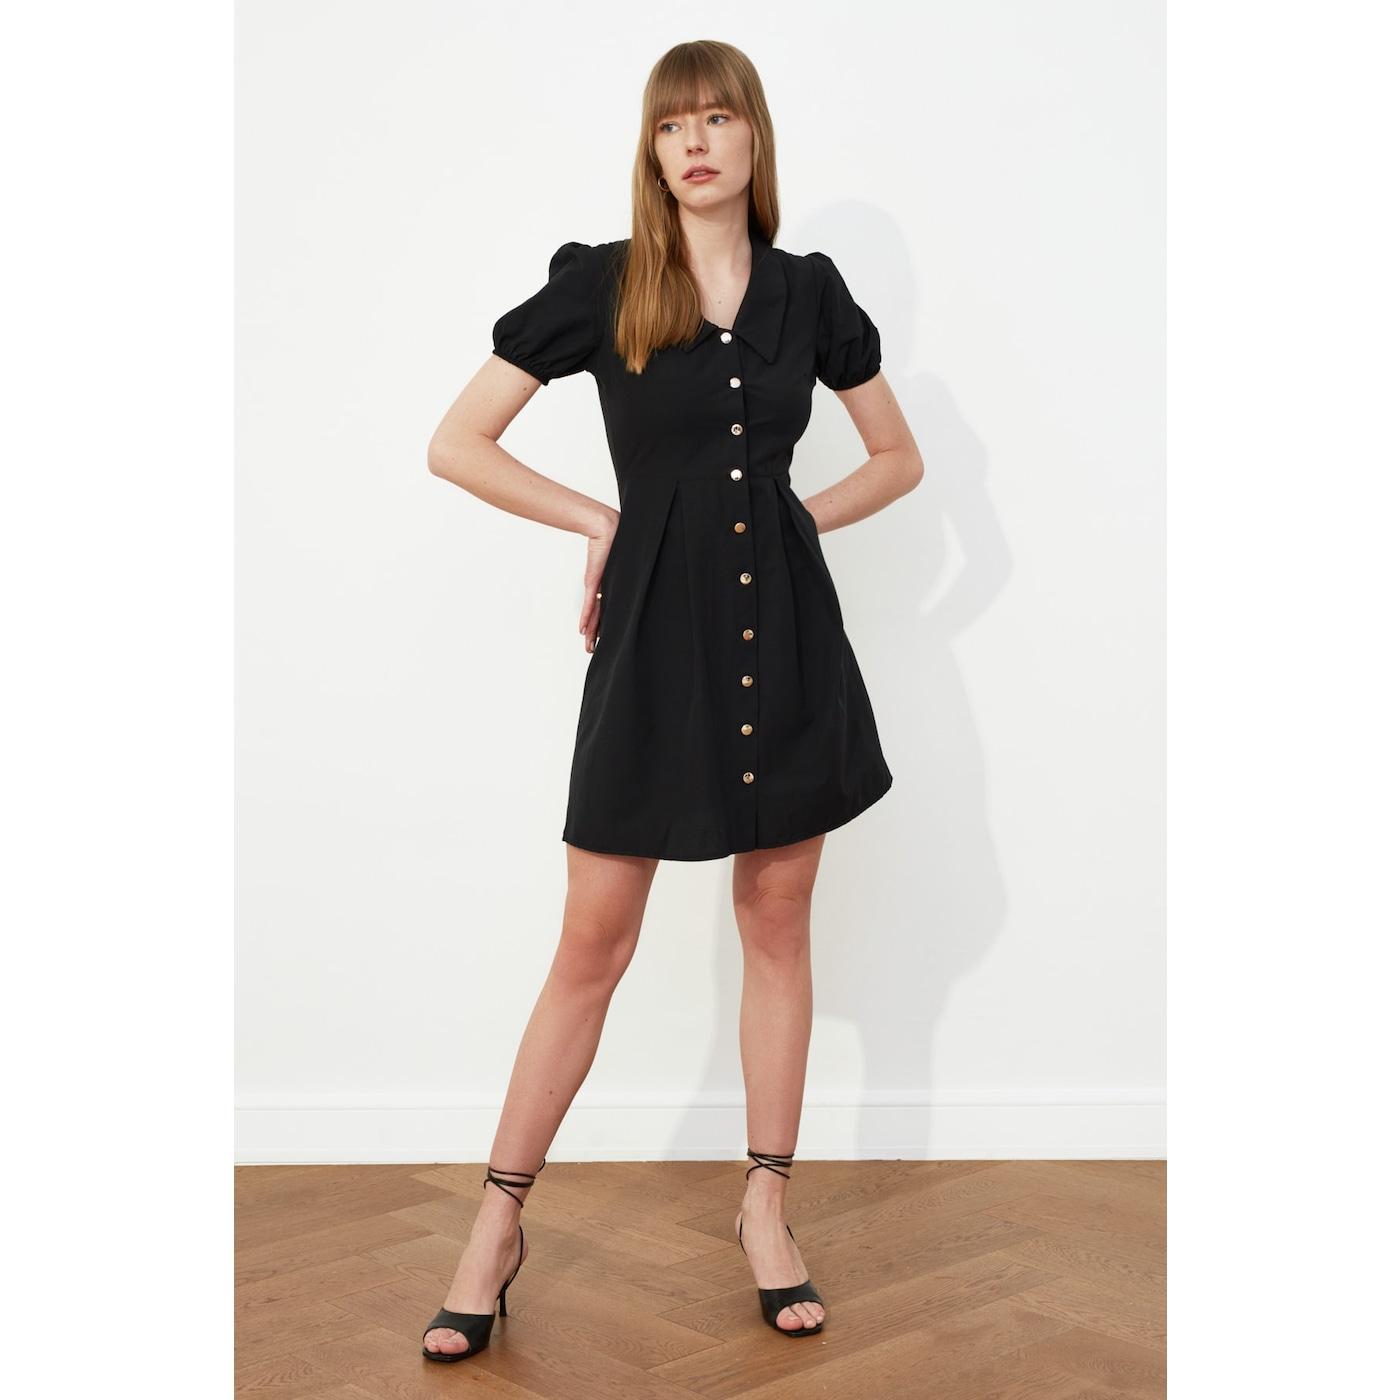 Trendyol Black Collar Detailed Buttoned Dress dámské 34